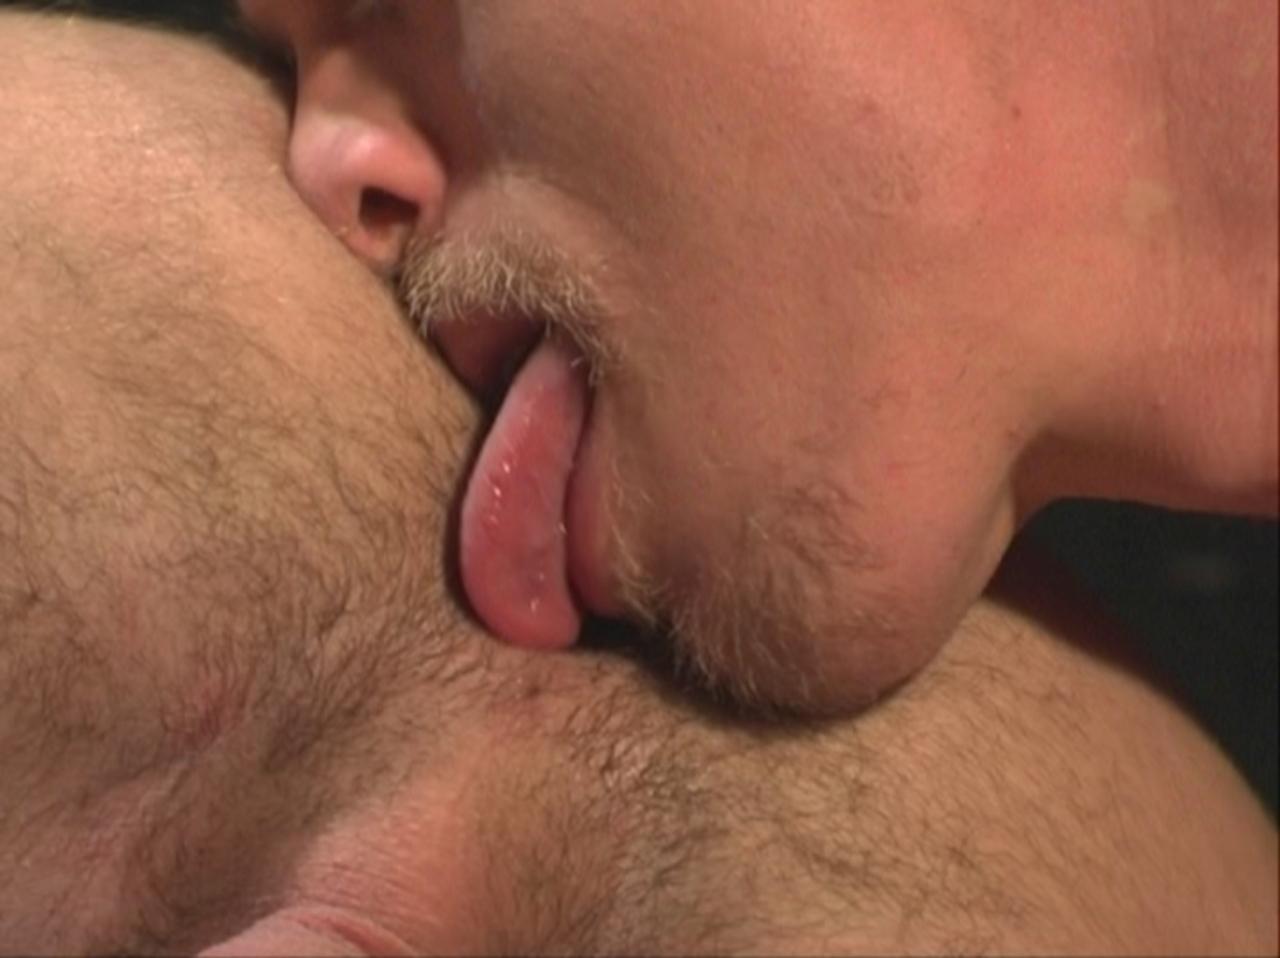 Male gay massage chicago